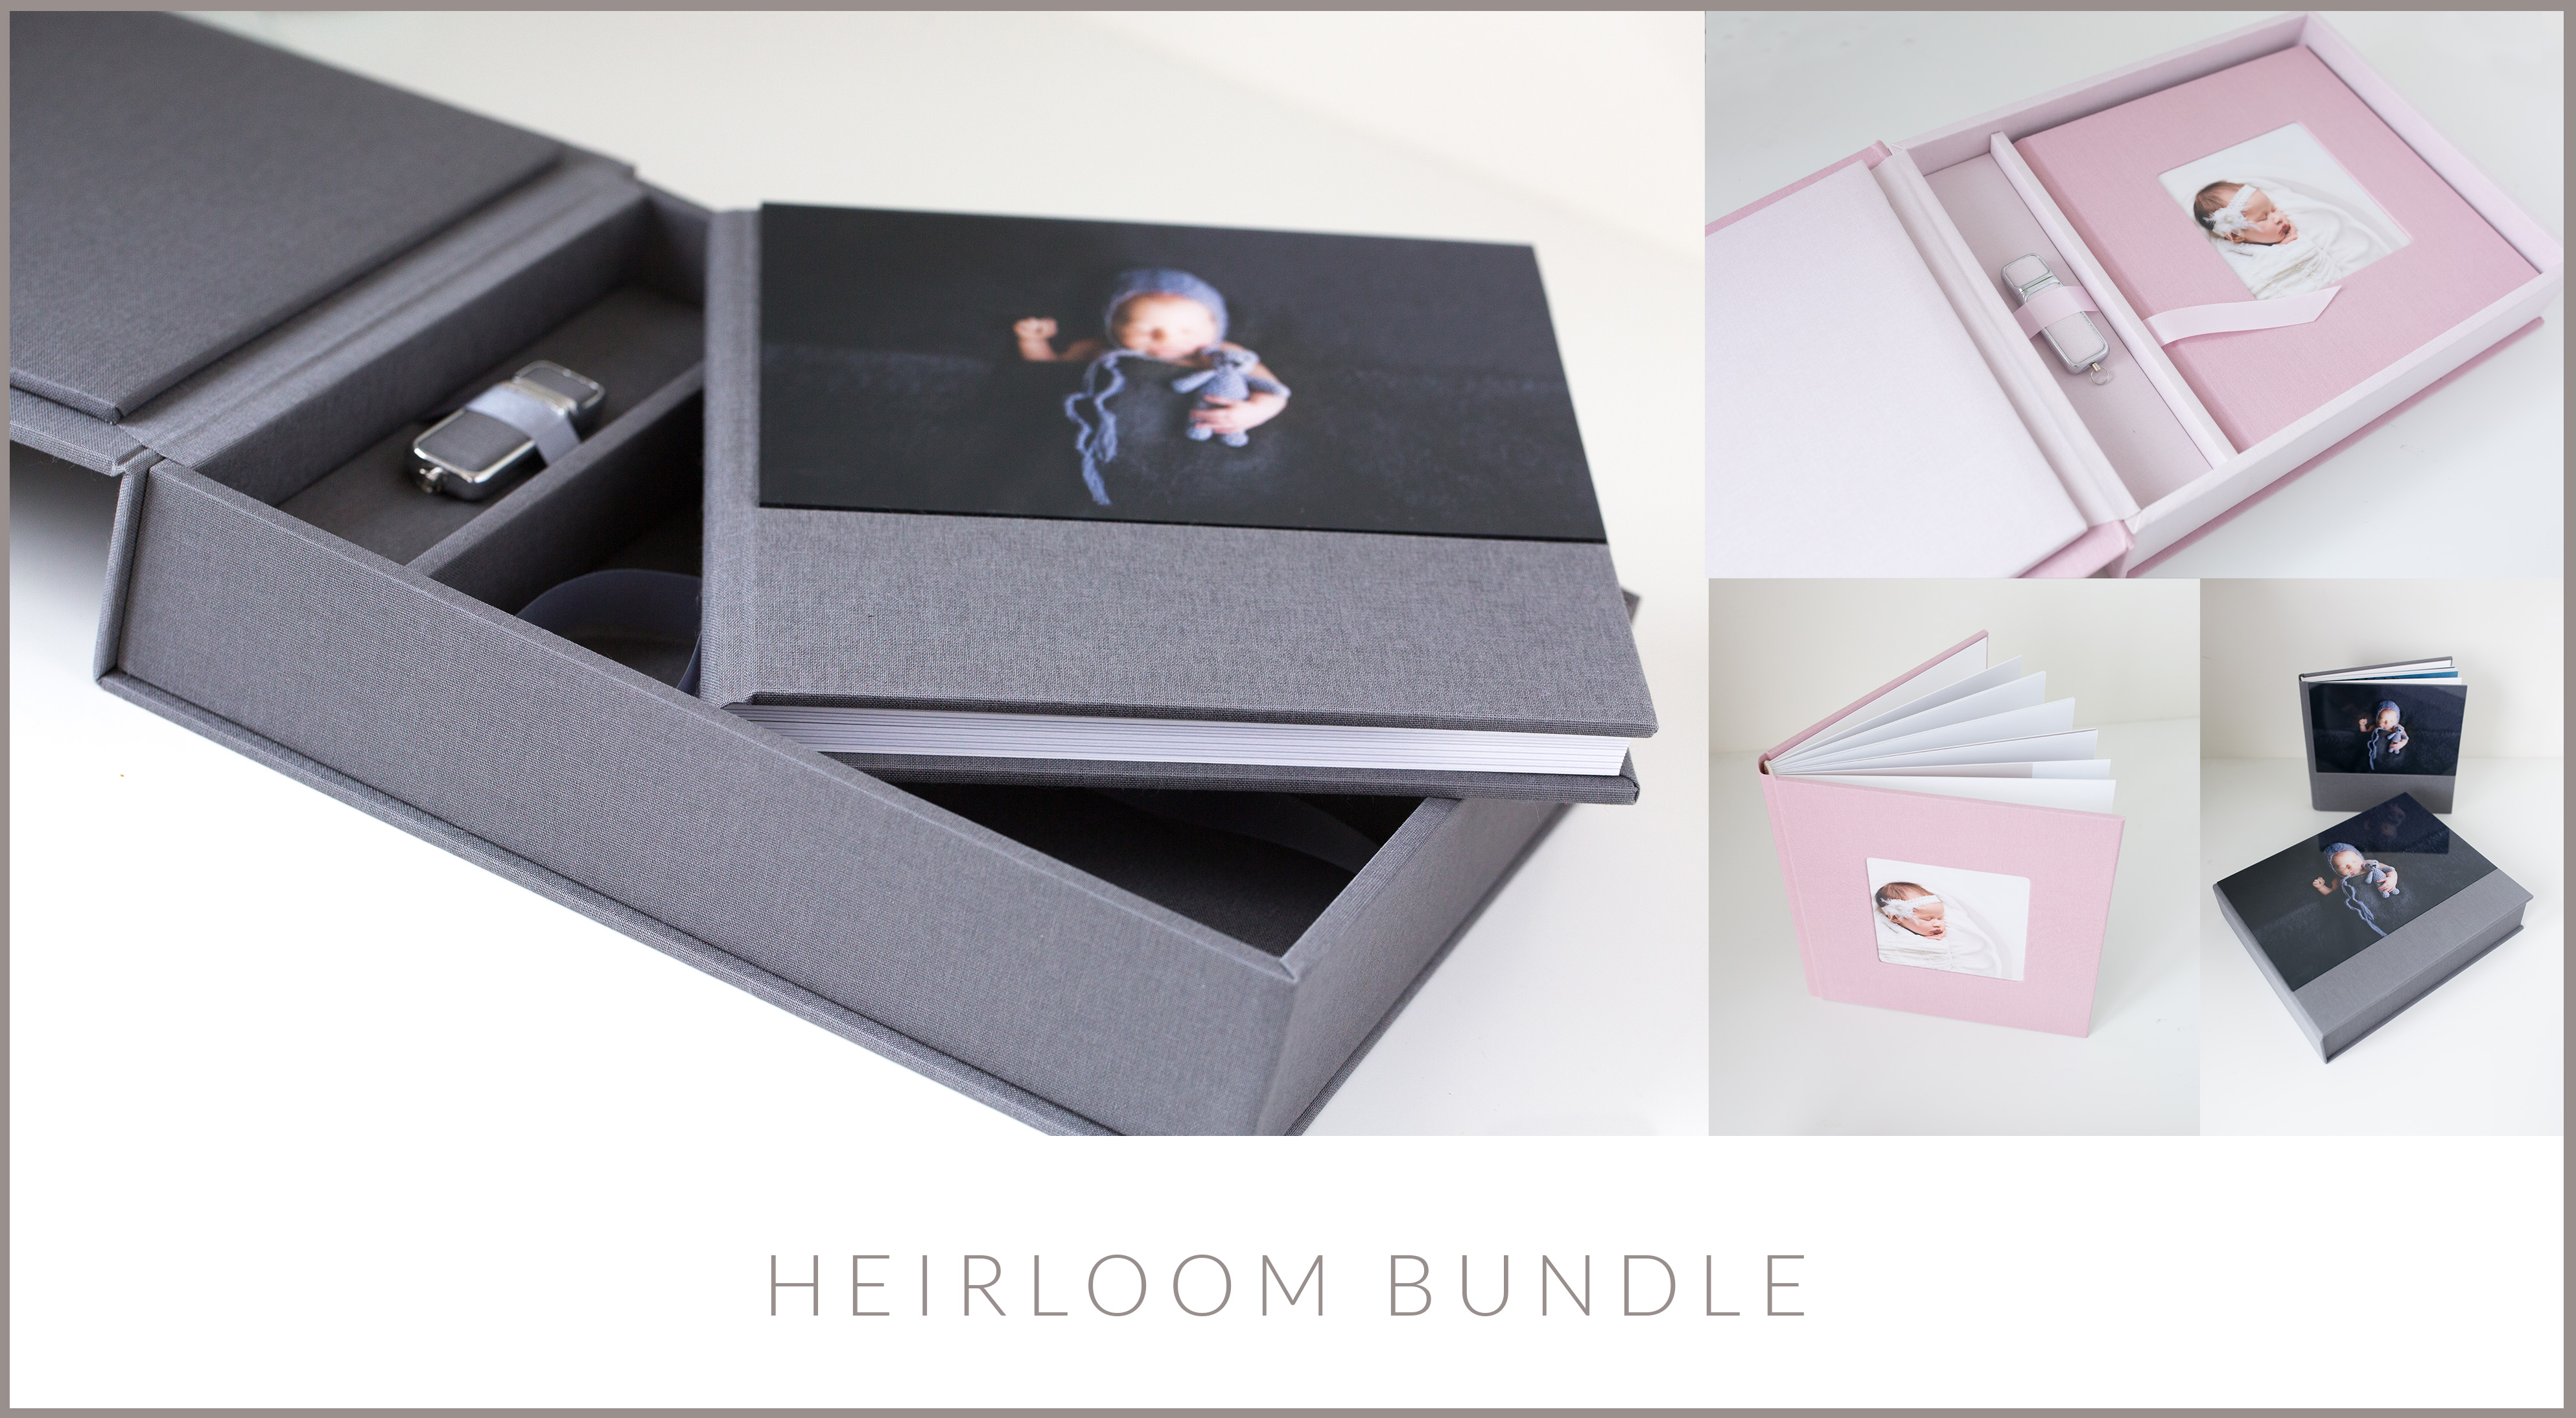 heirloom bundle